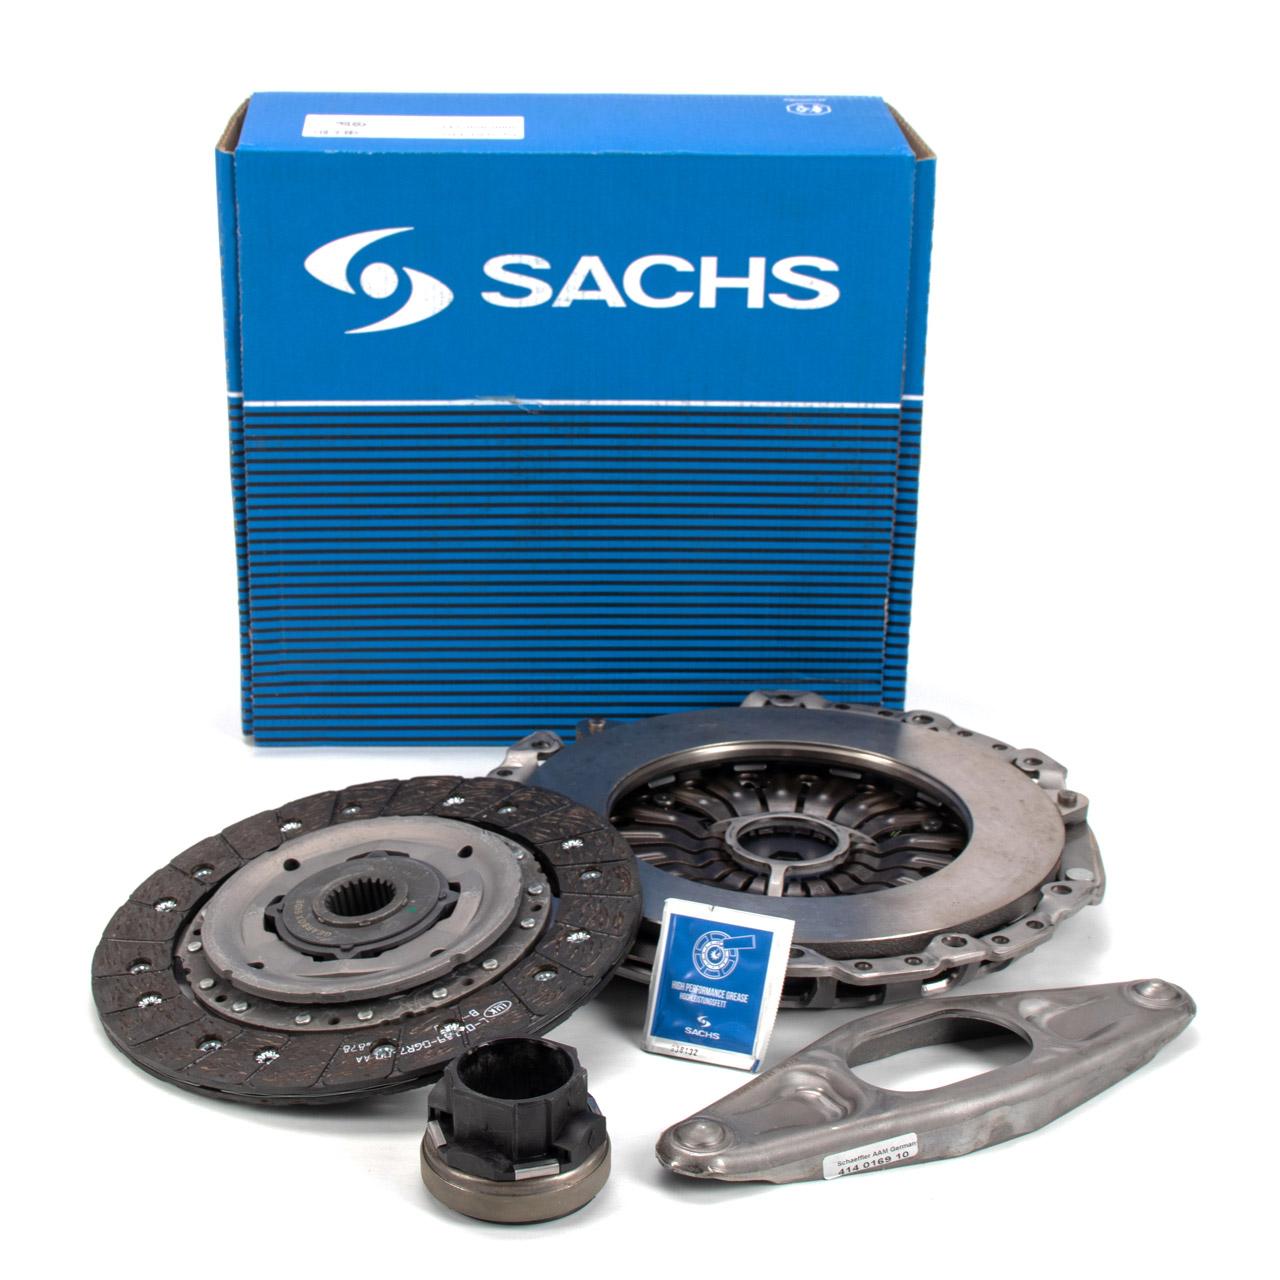 SACHS Kupplungssatz + Ausrücklager für BMW E81-E88 F20 E90-E93 F30 N47 B47 21208631807